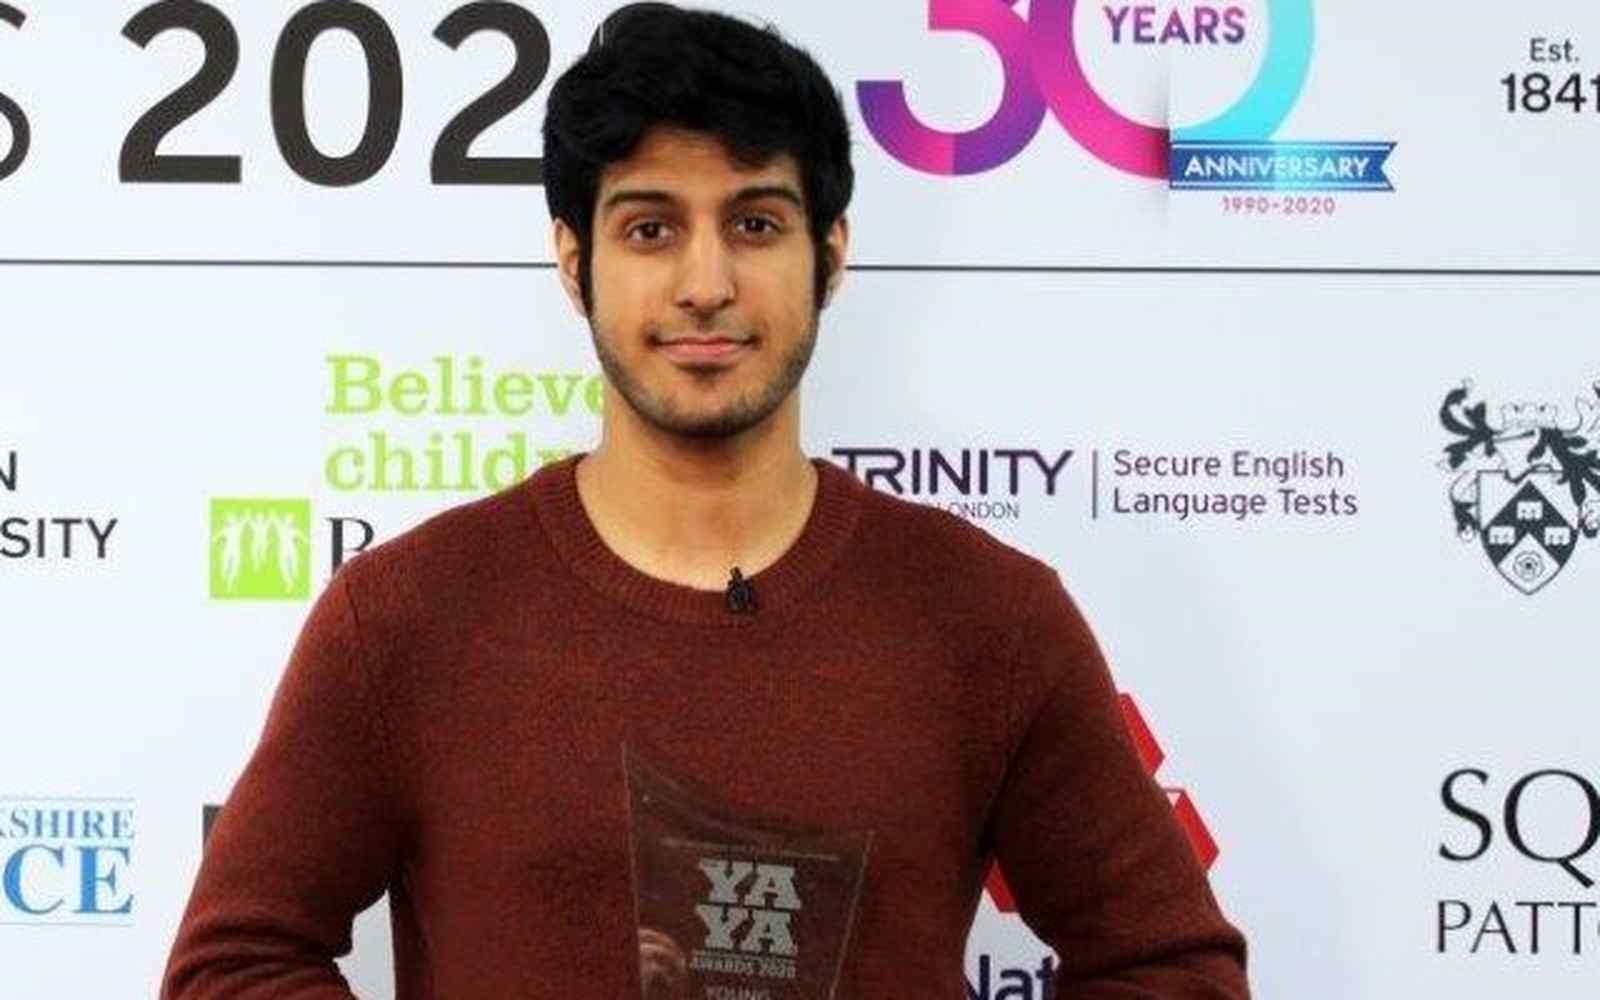 YAYA Awards winner with sculpture trophy in hands